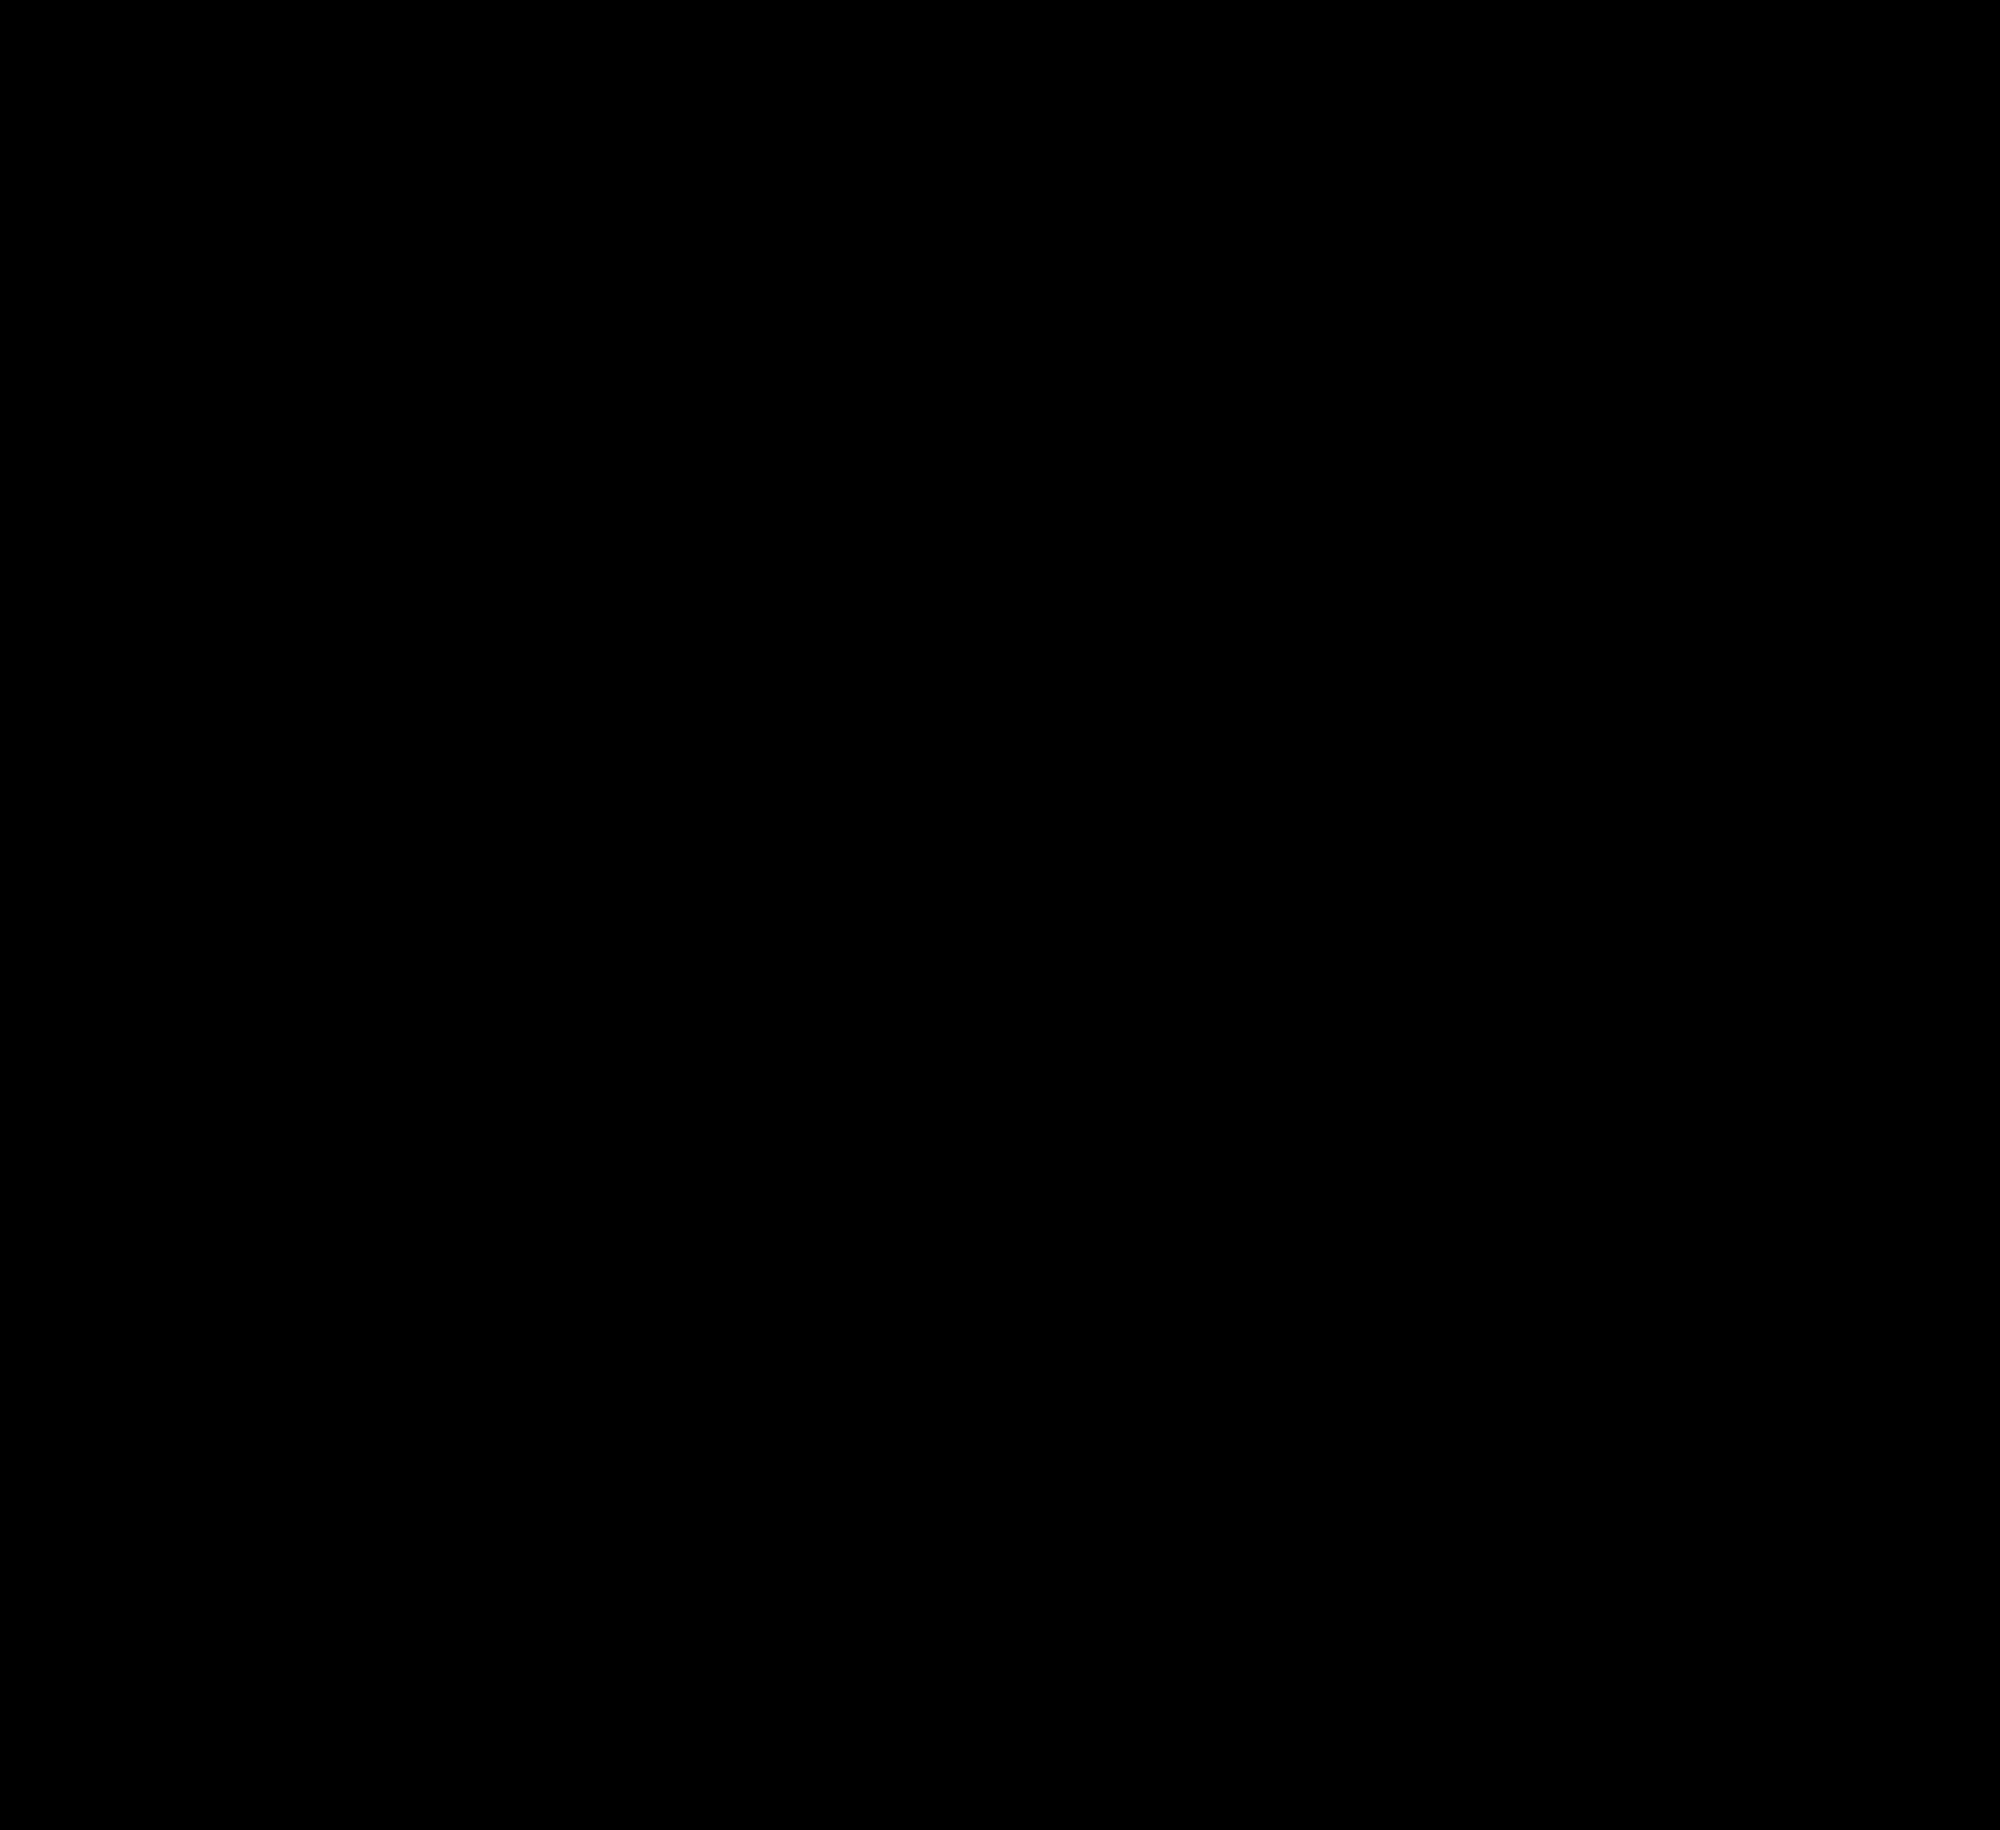 Avatar of user Shortgirl Shortbread